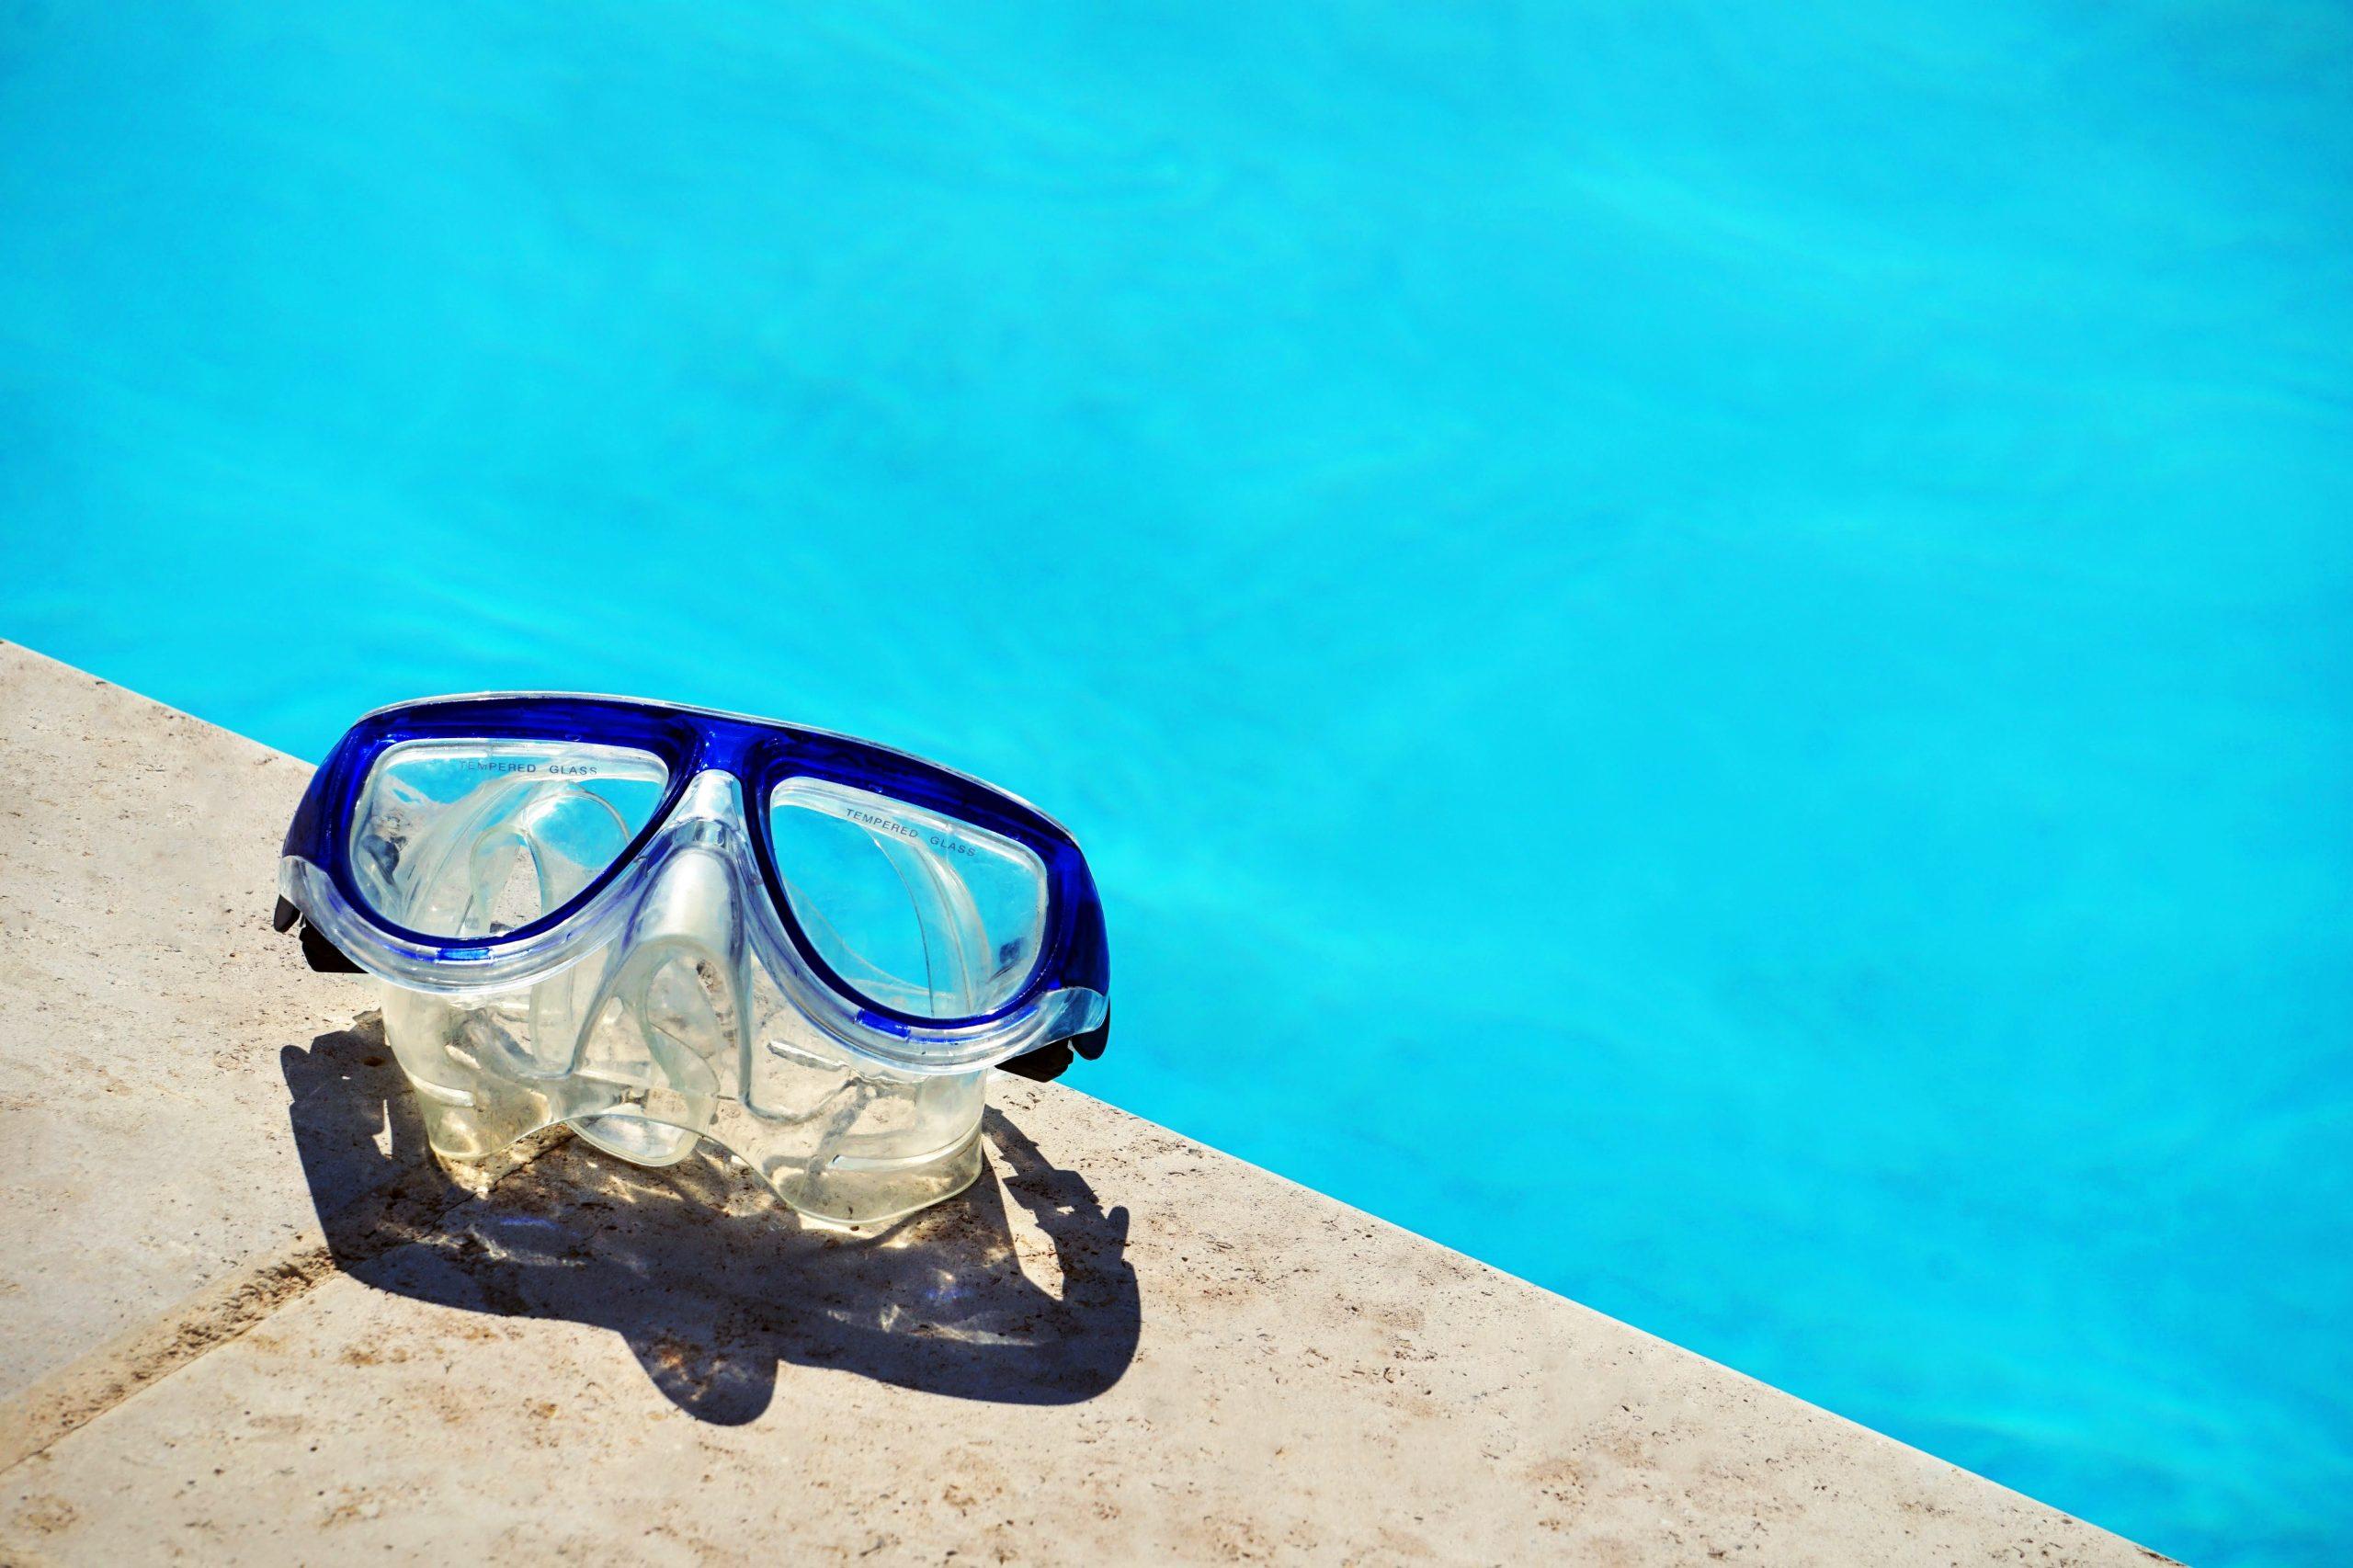 Mascara de snorkel a la orilla de piscina